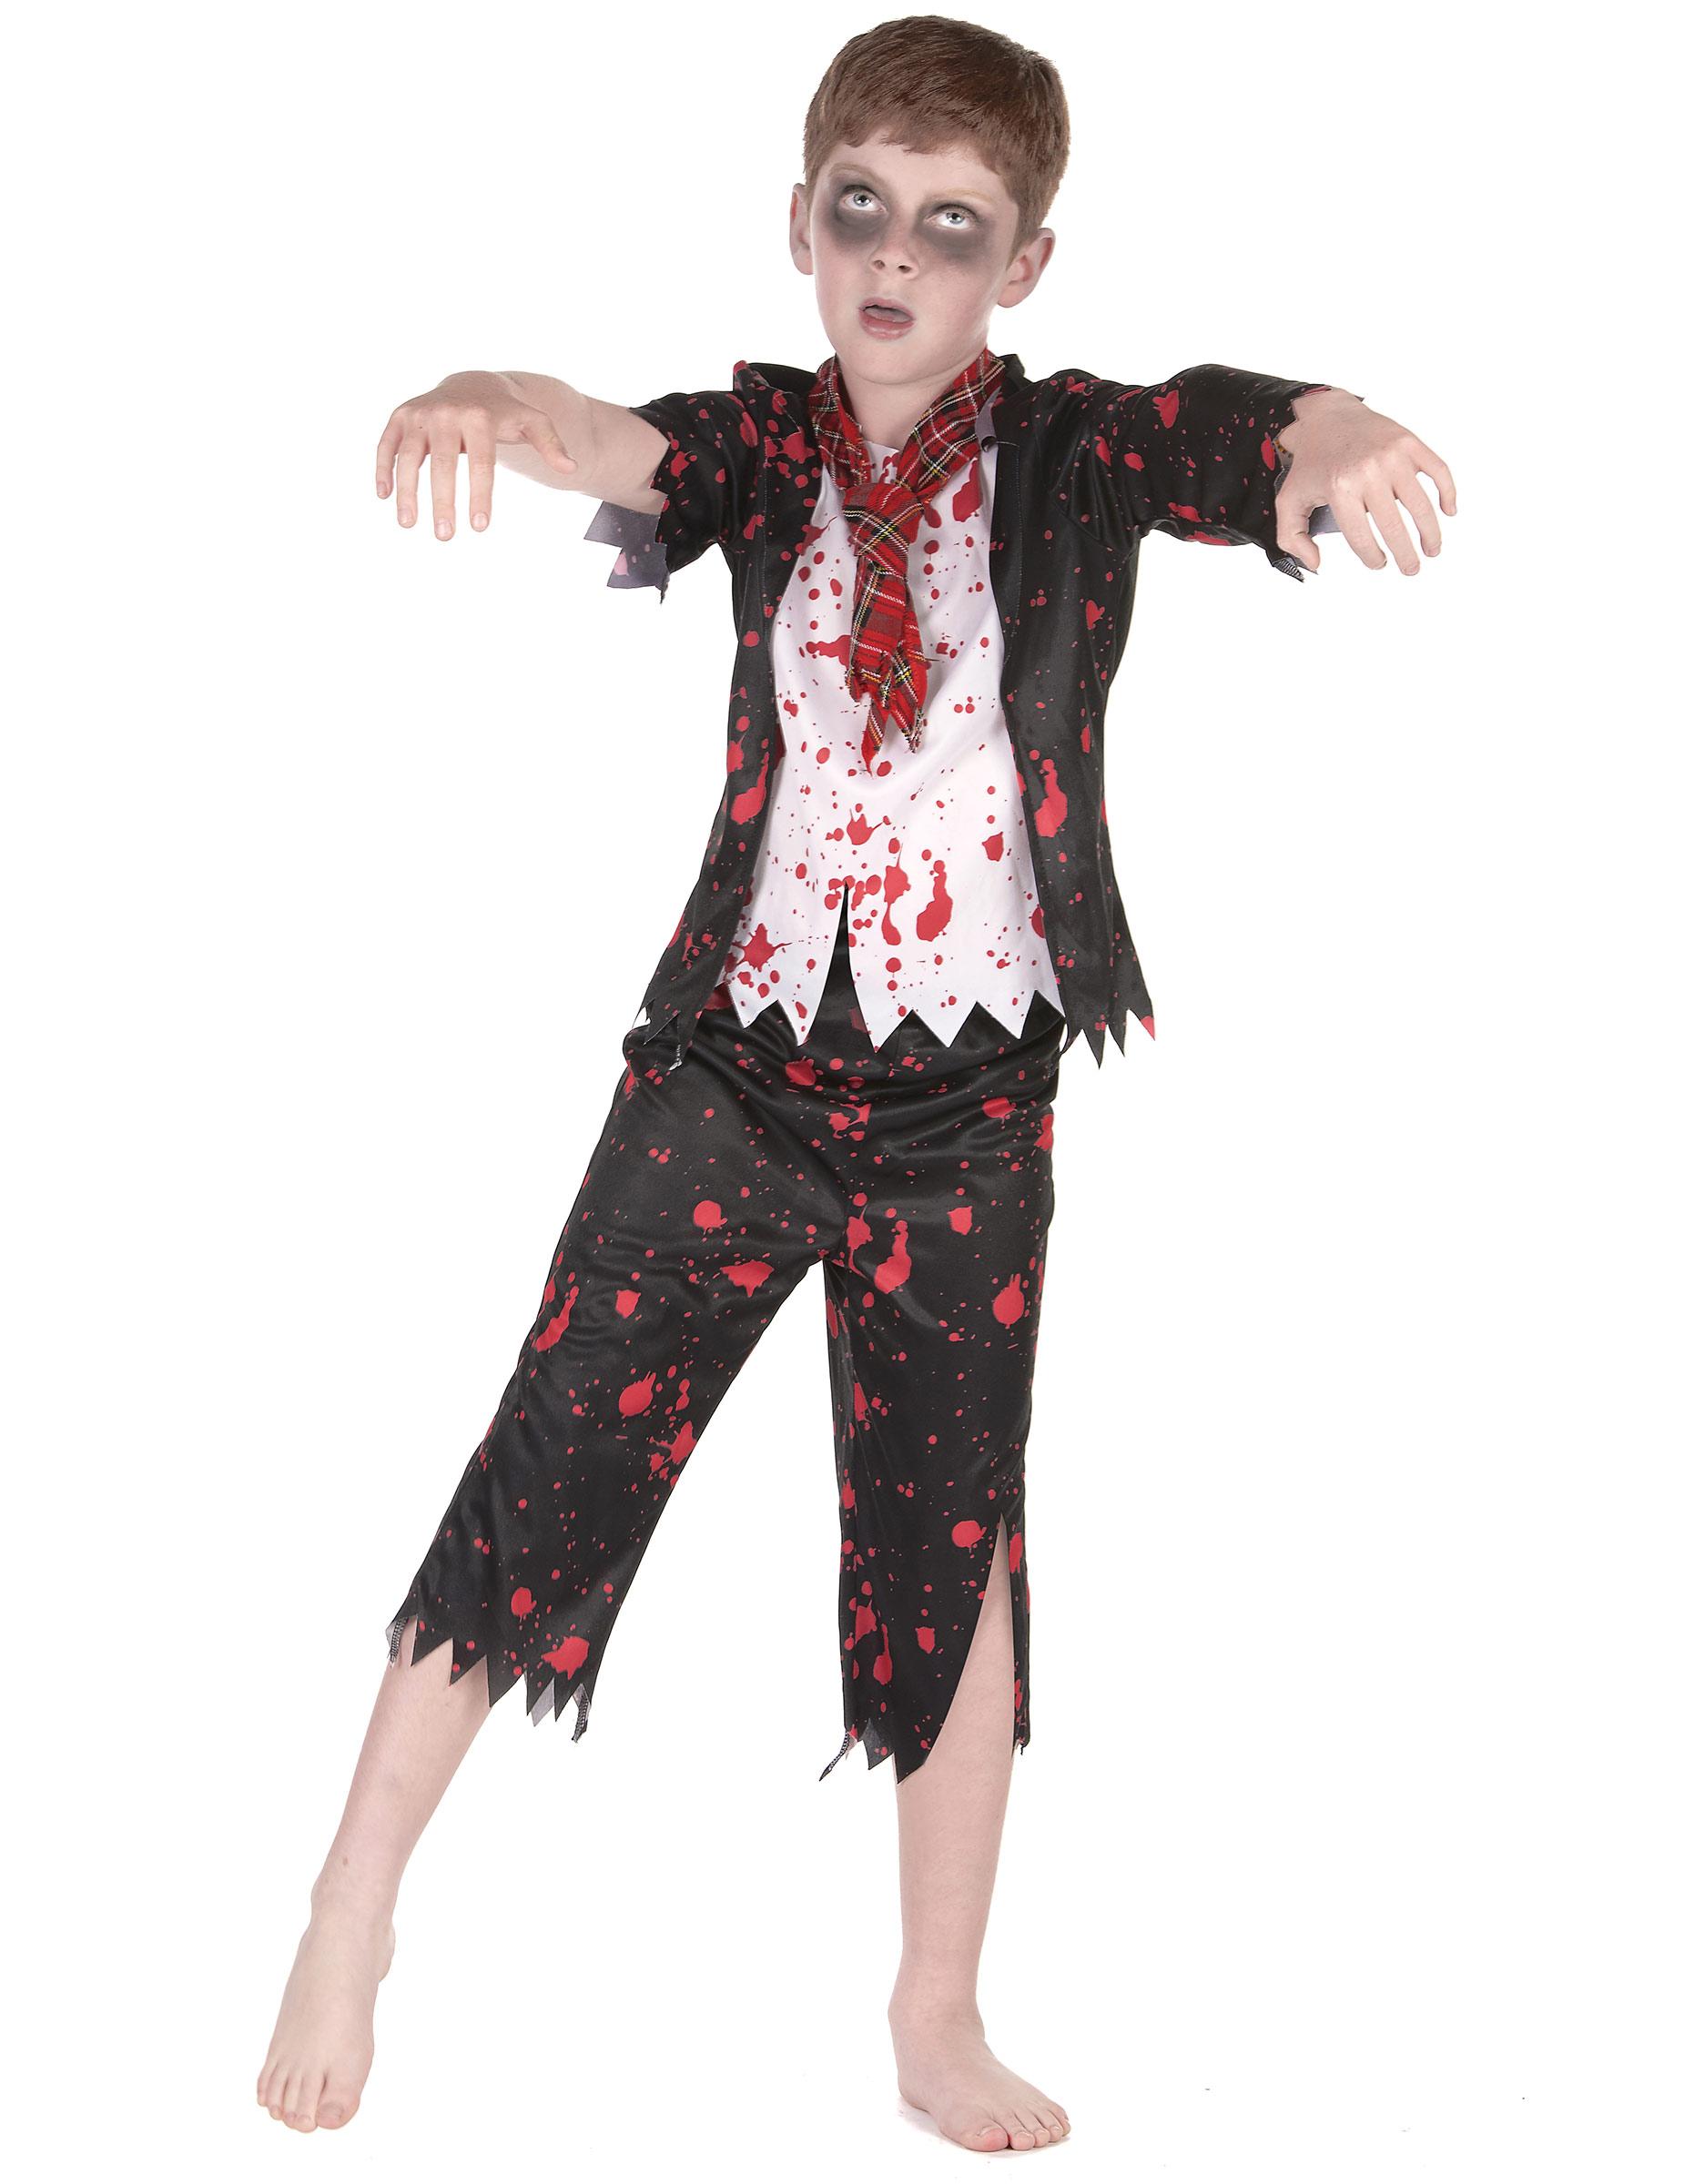 #Zombiehaftes Schüler-Kostüm für Jungen Halloween schwarz-weiss-rot#